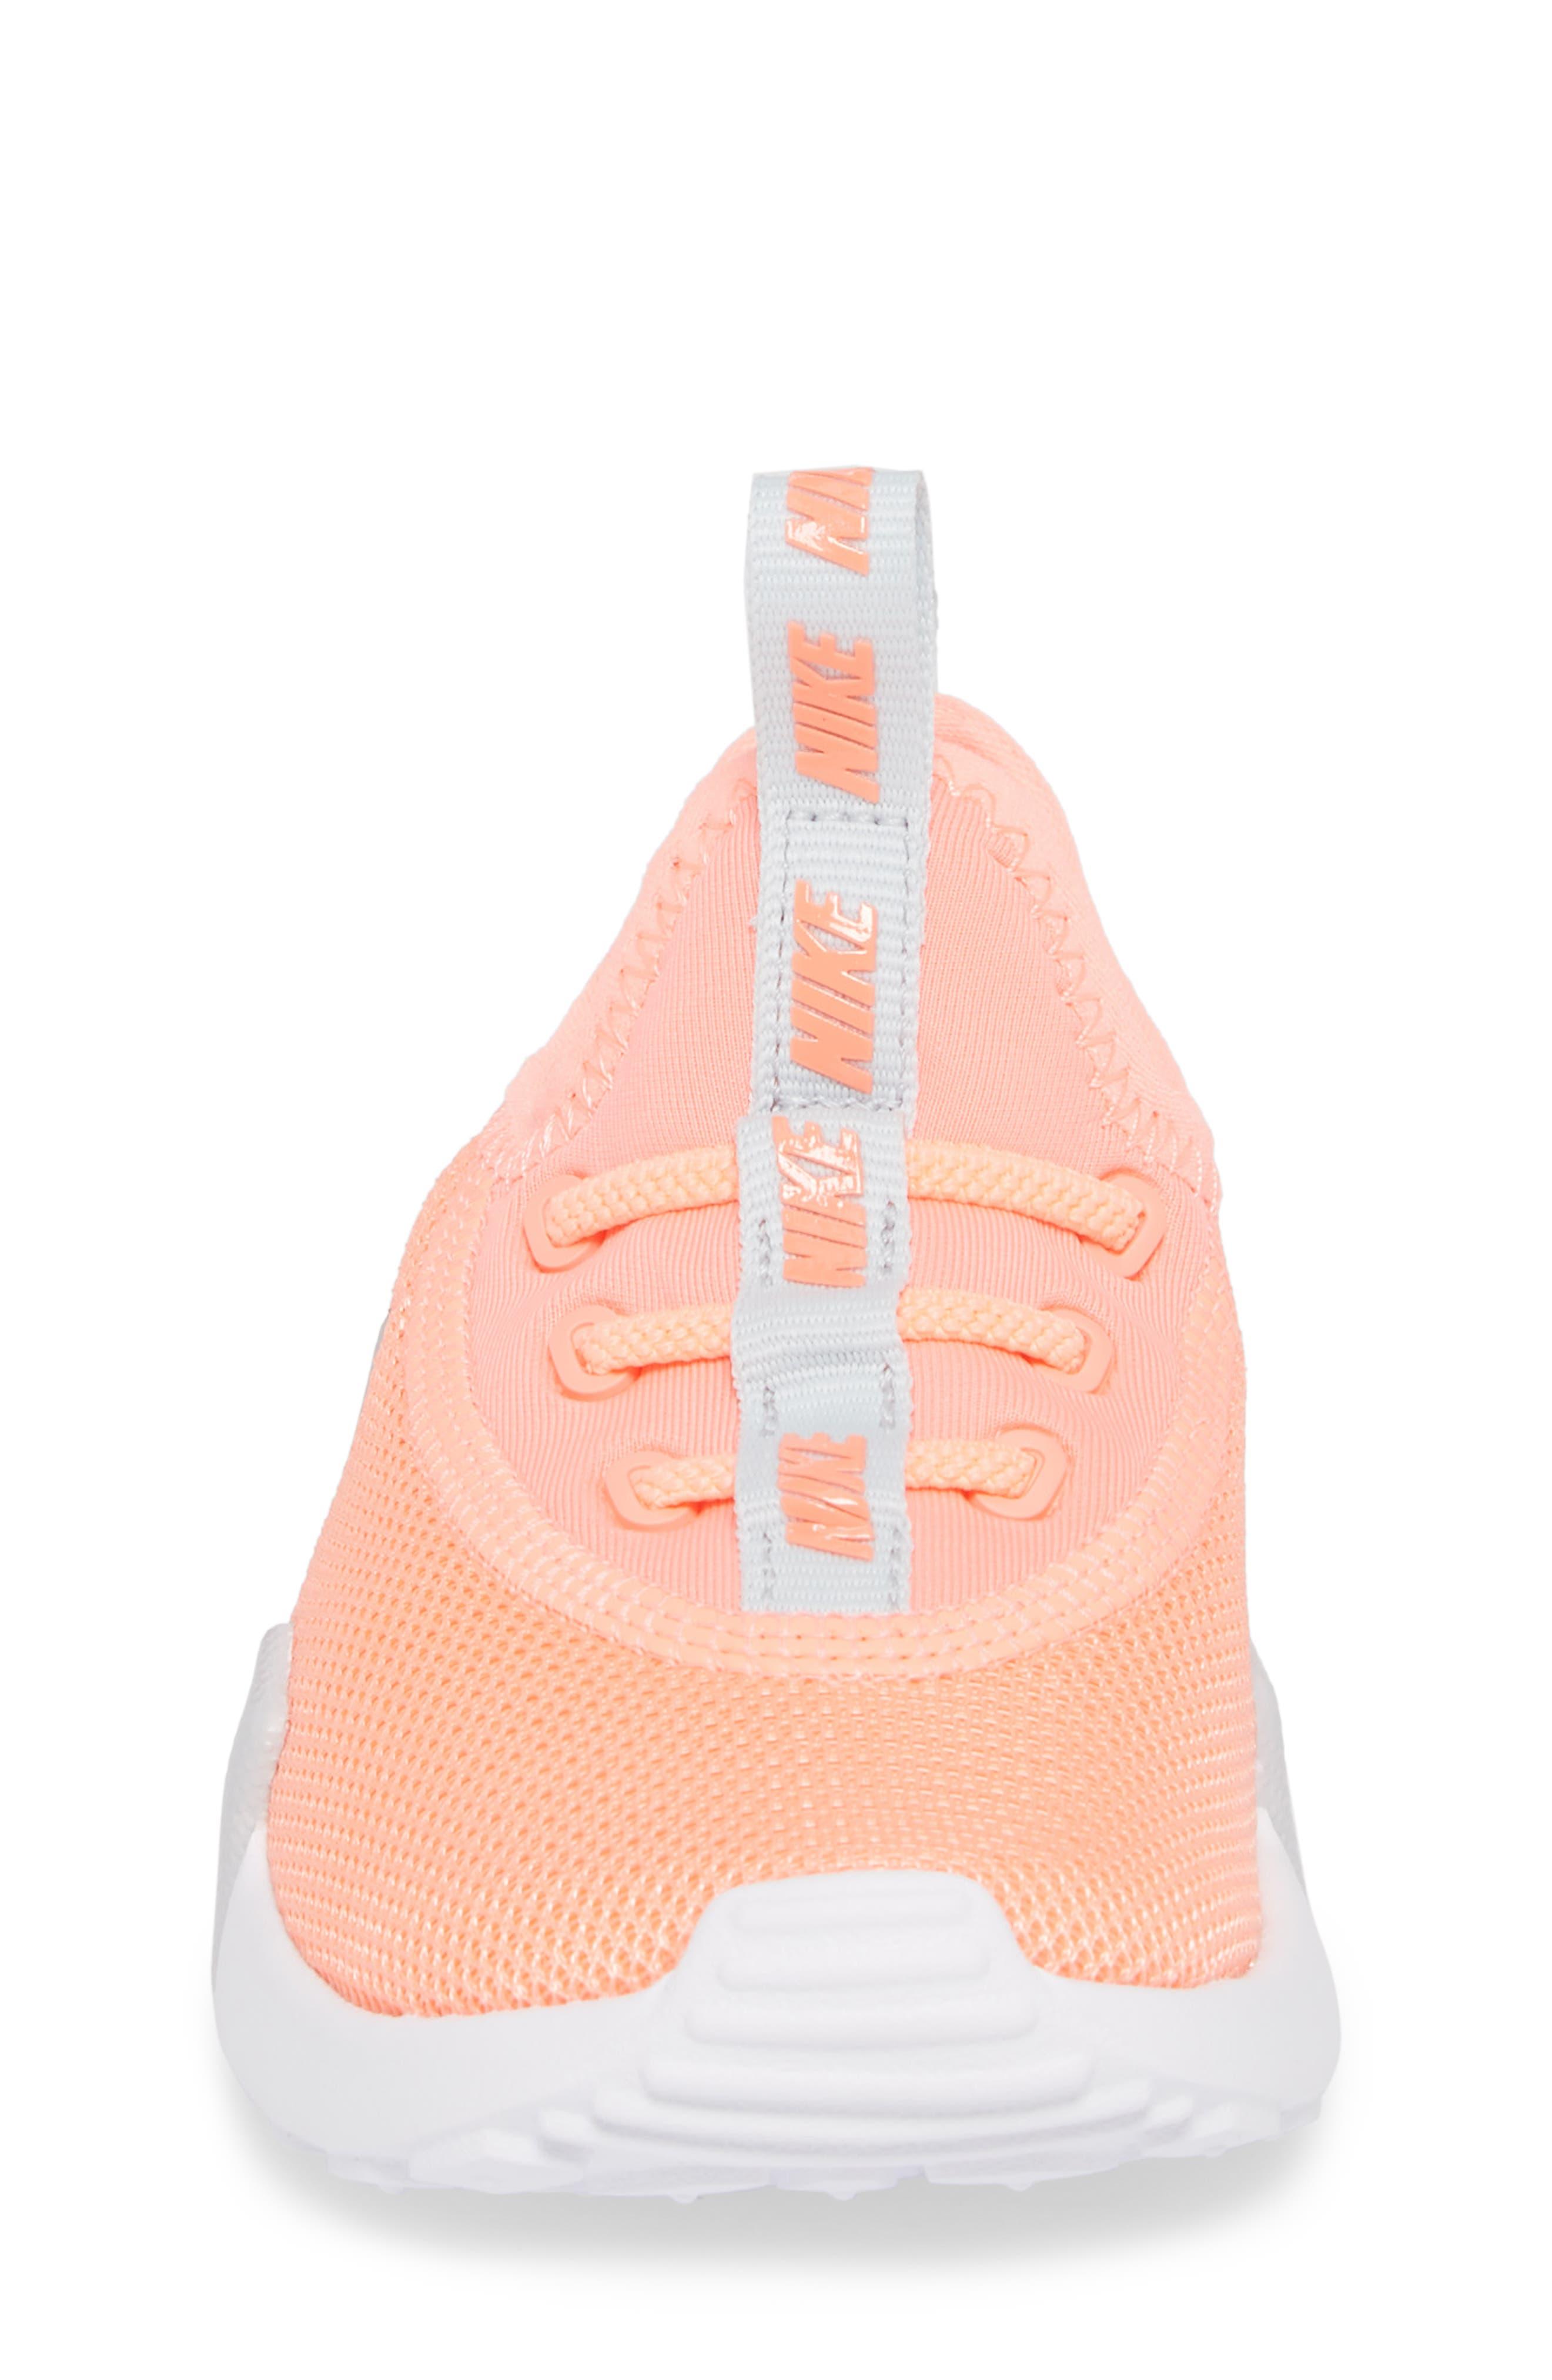 Ashin Modern Sock Knit Sneaker,                             Alternate thumbnail 4, color,                             ATOMIC PINK/ METALLIC SILVER